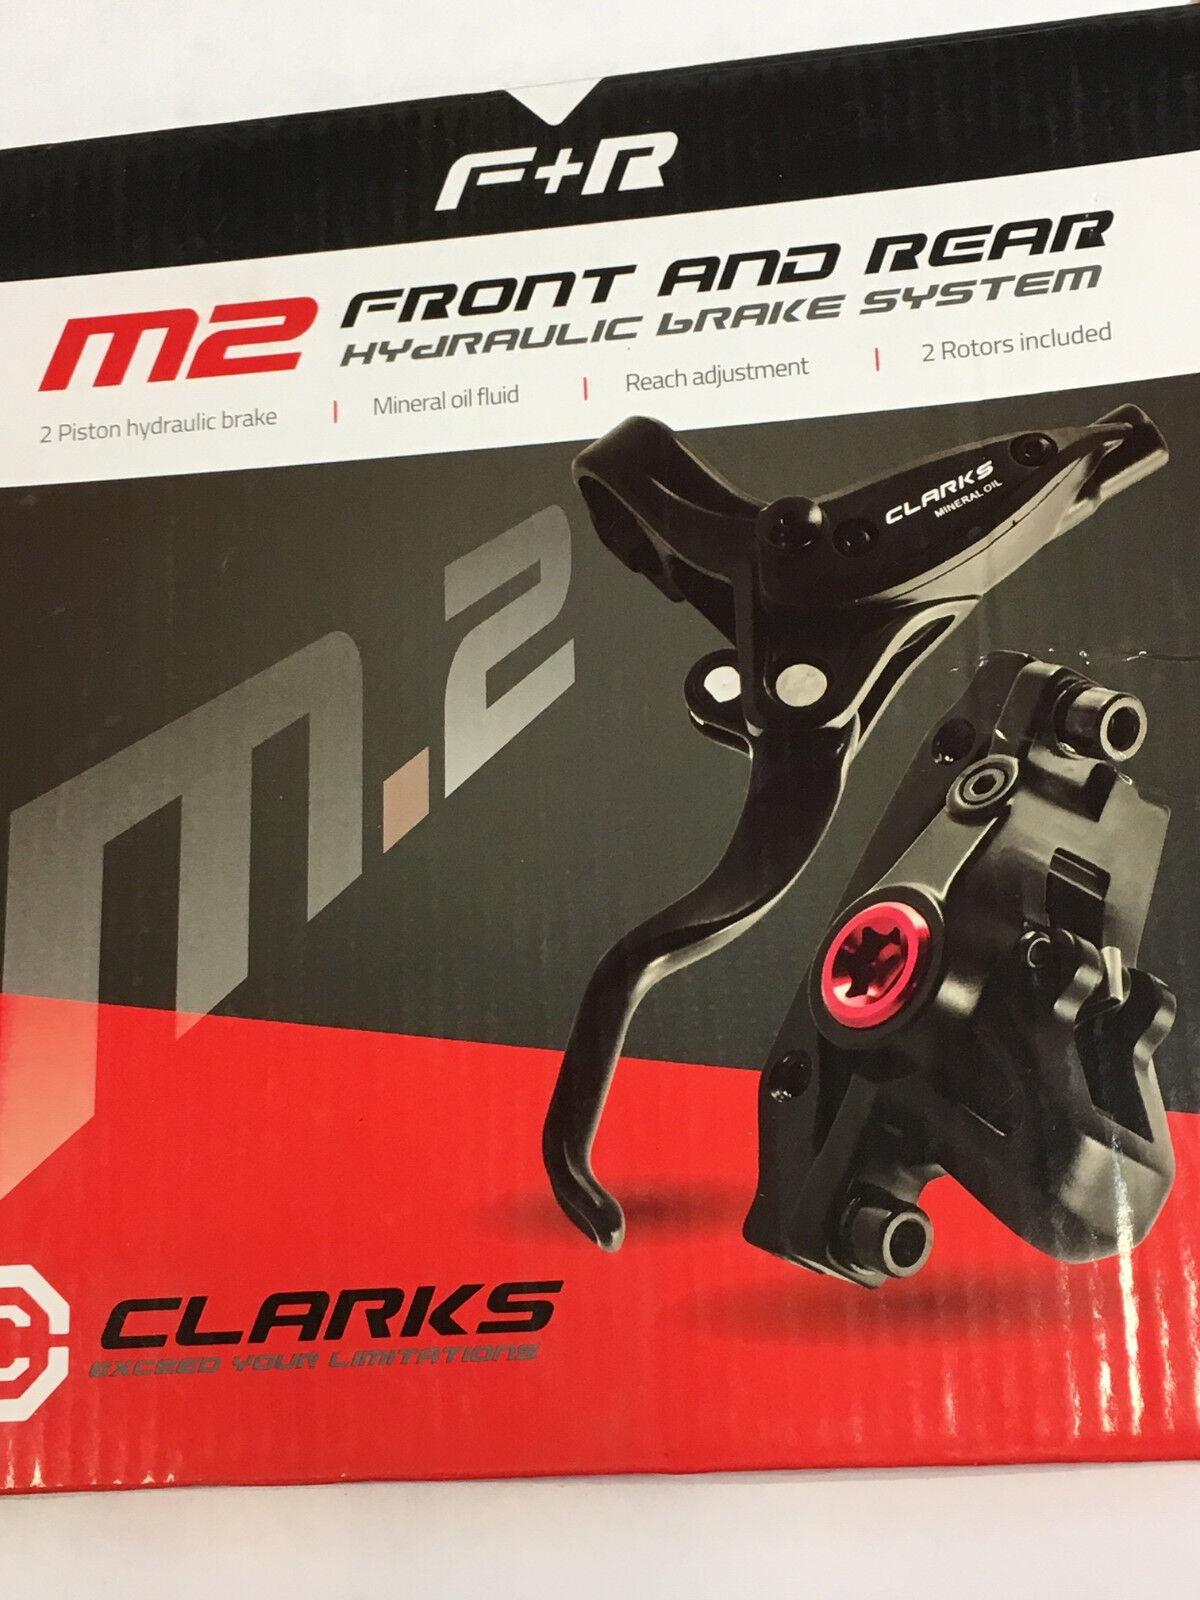 Clarks M2 Front & Rear Hydraulic Disc Brake Set (Rotor Größe Option)